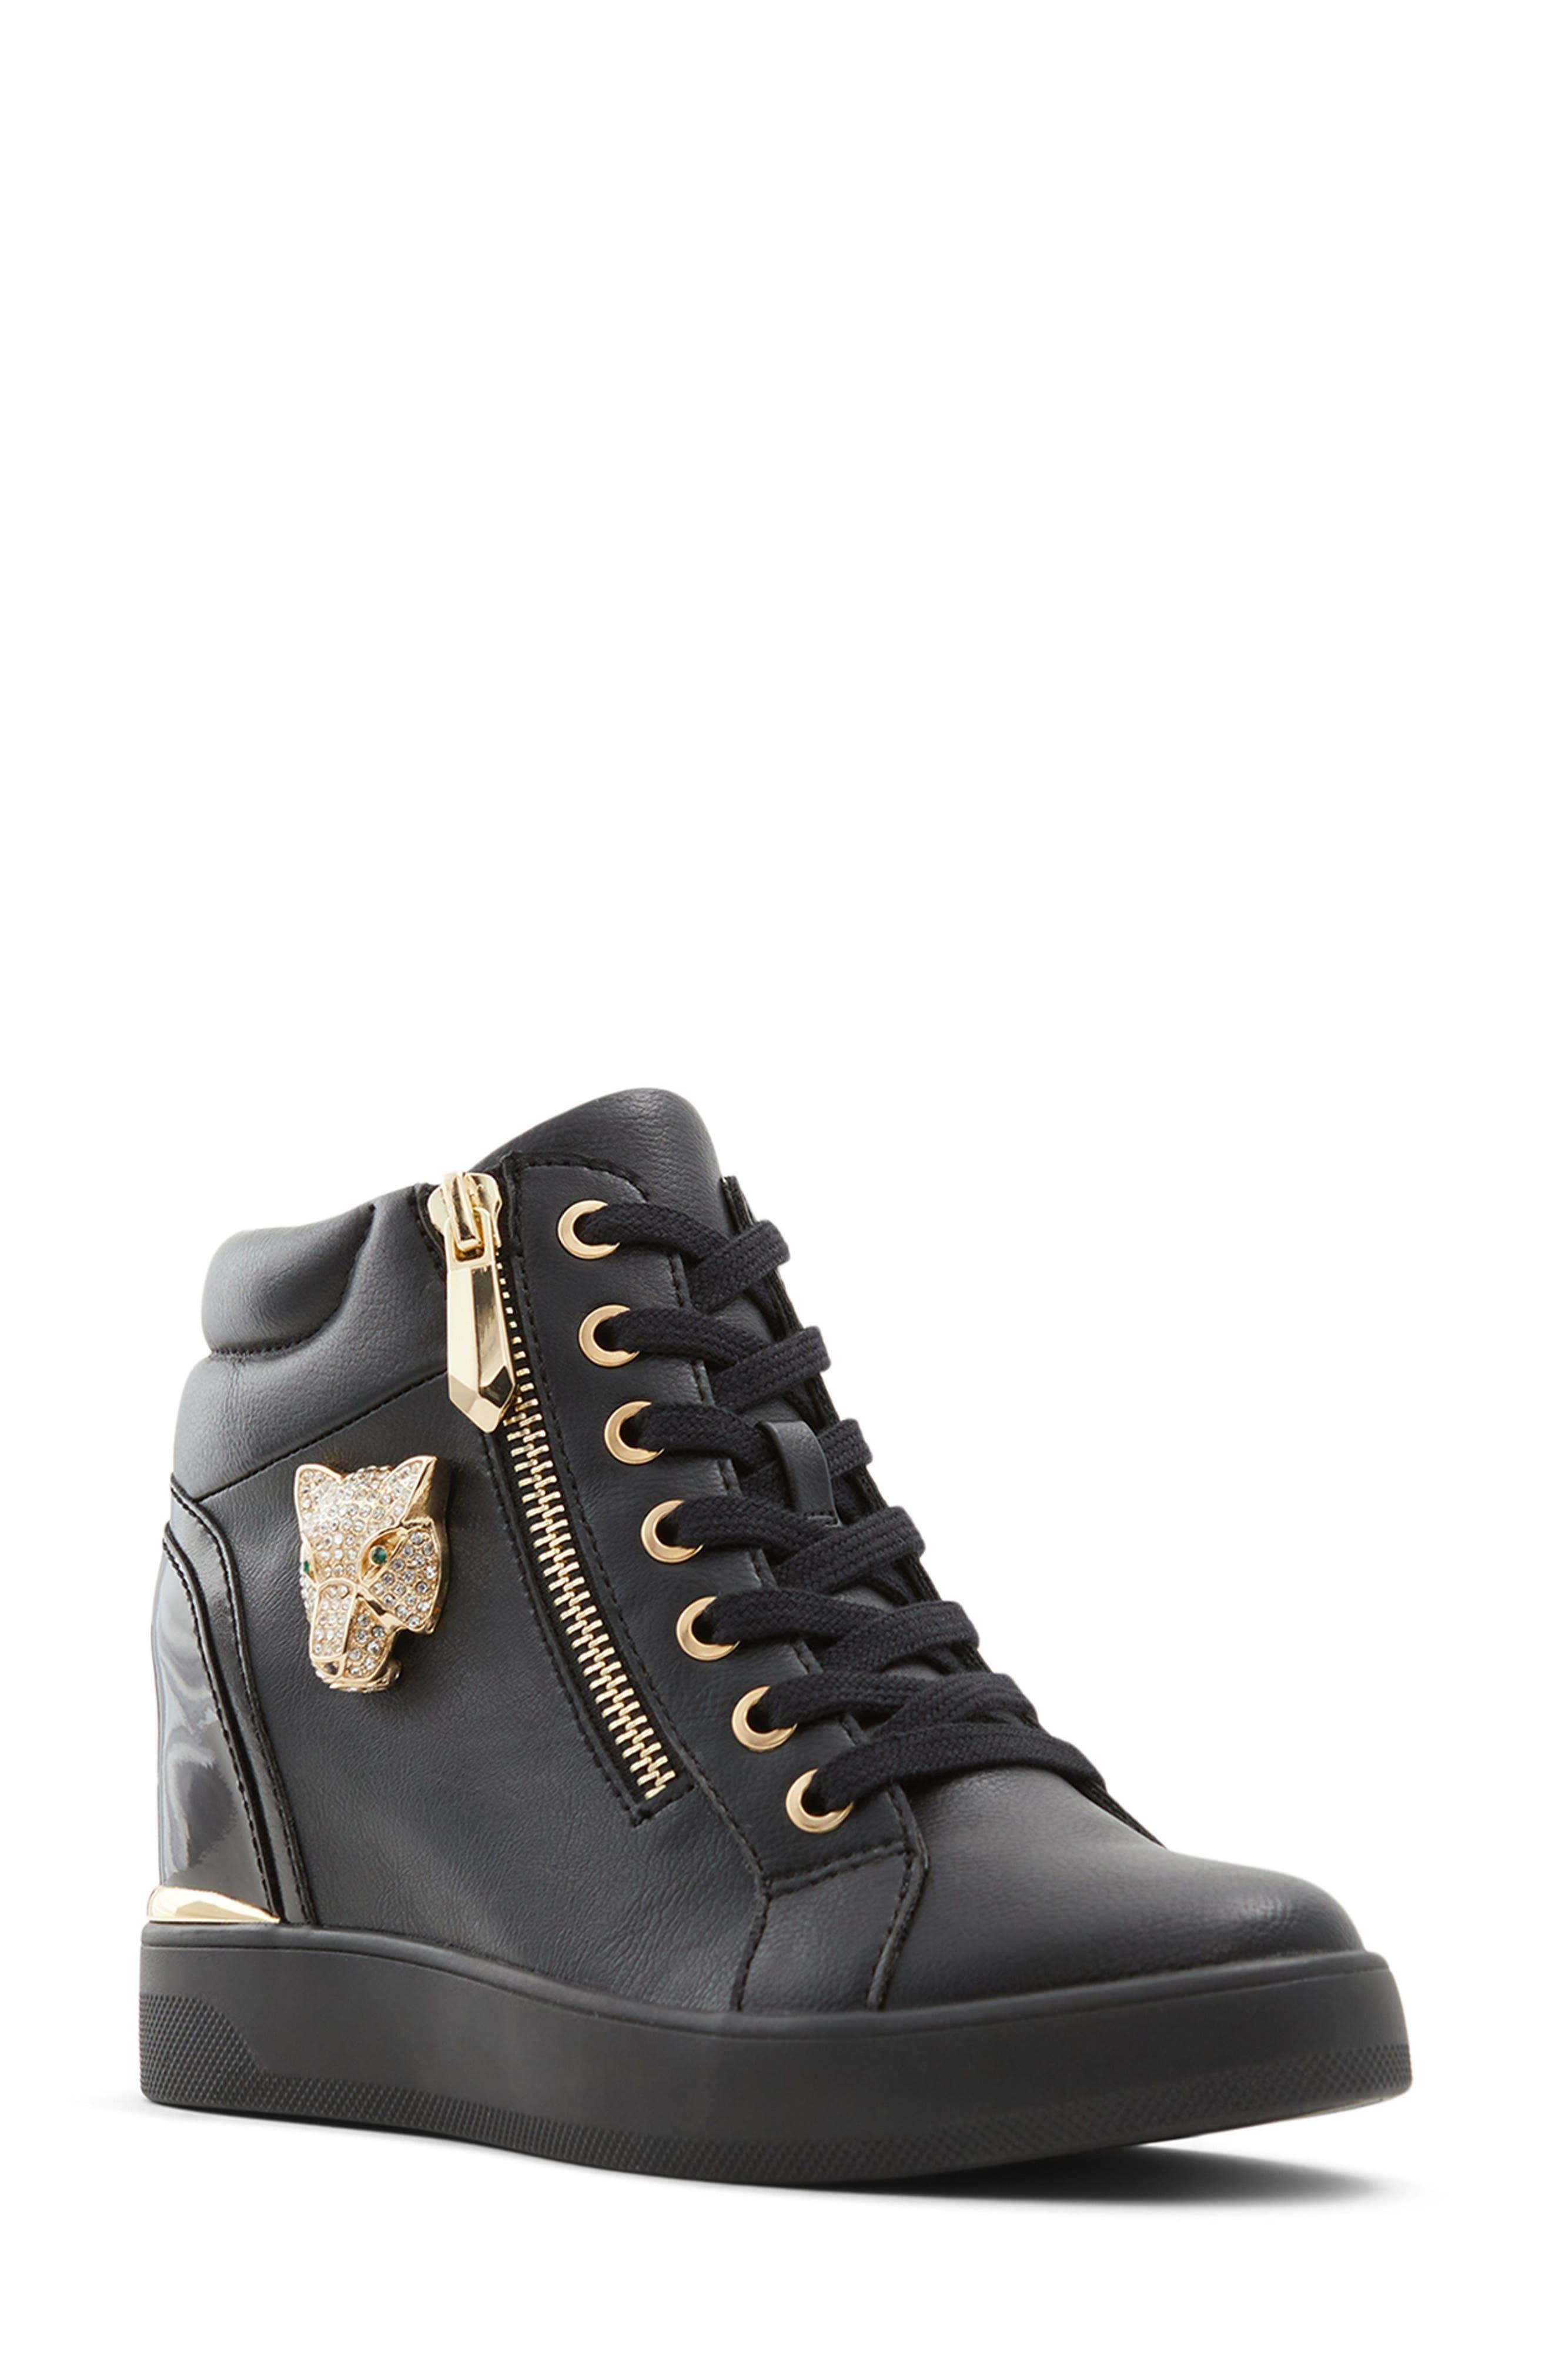 Aloivu Wedge High Top Sneaker